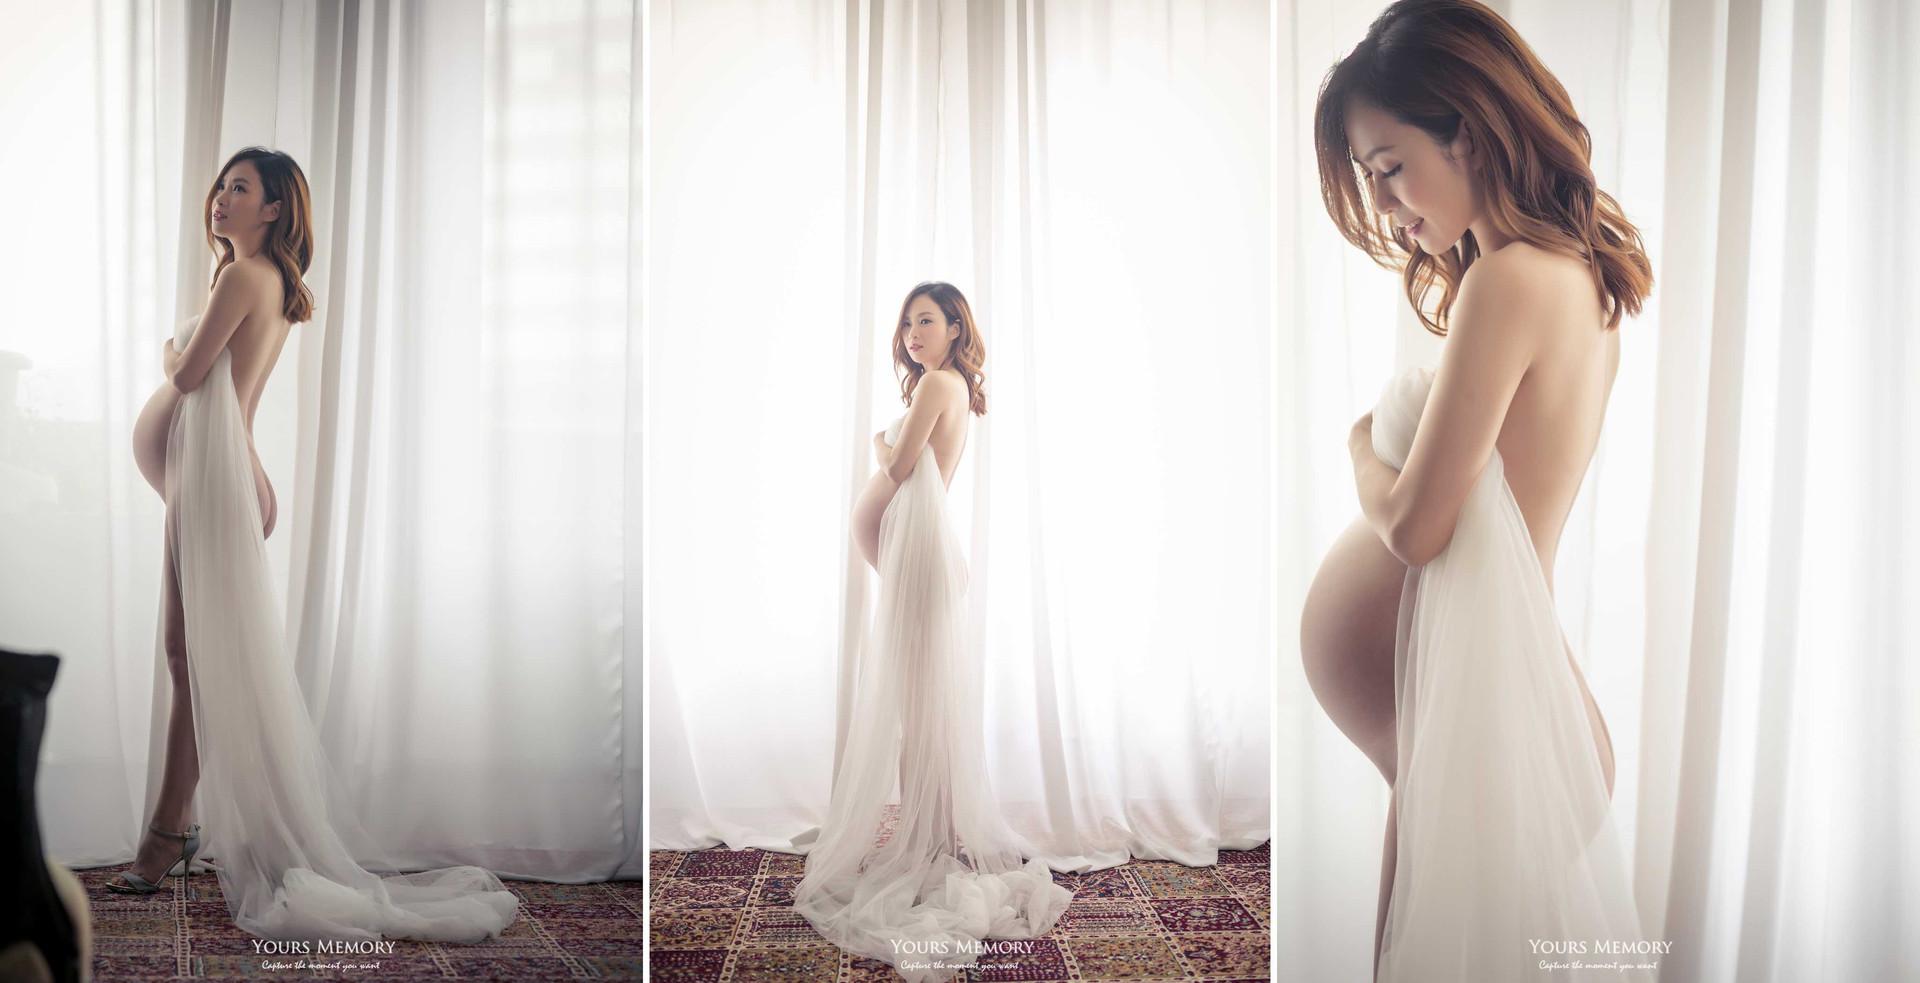 pregnancy_introduction_2-2019_5.jpg